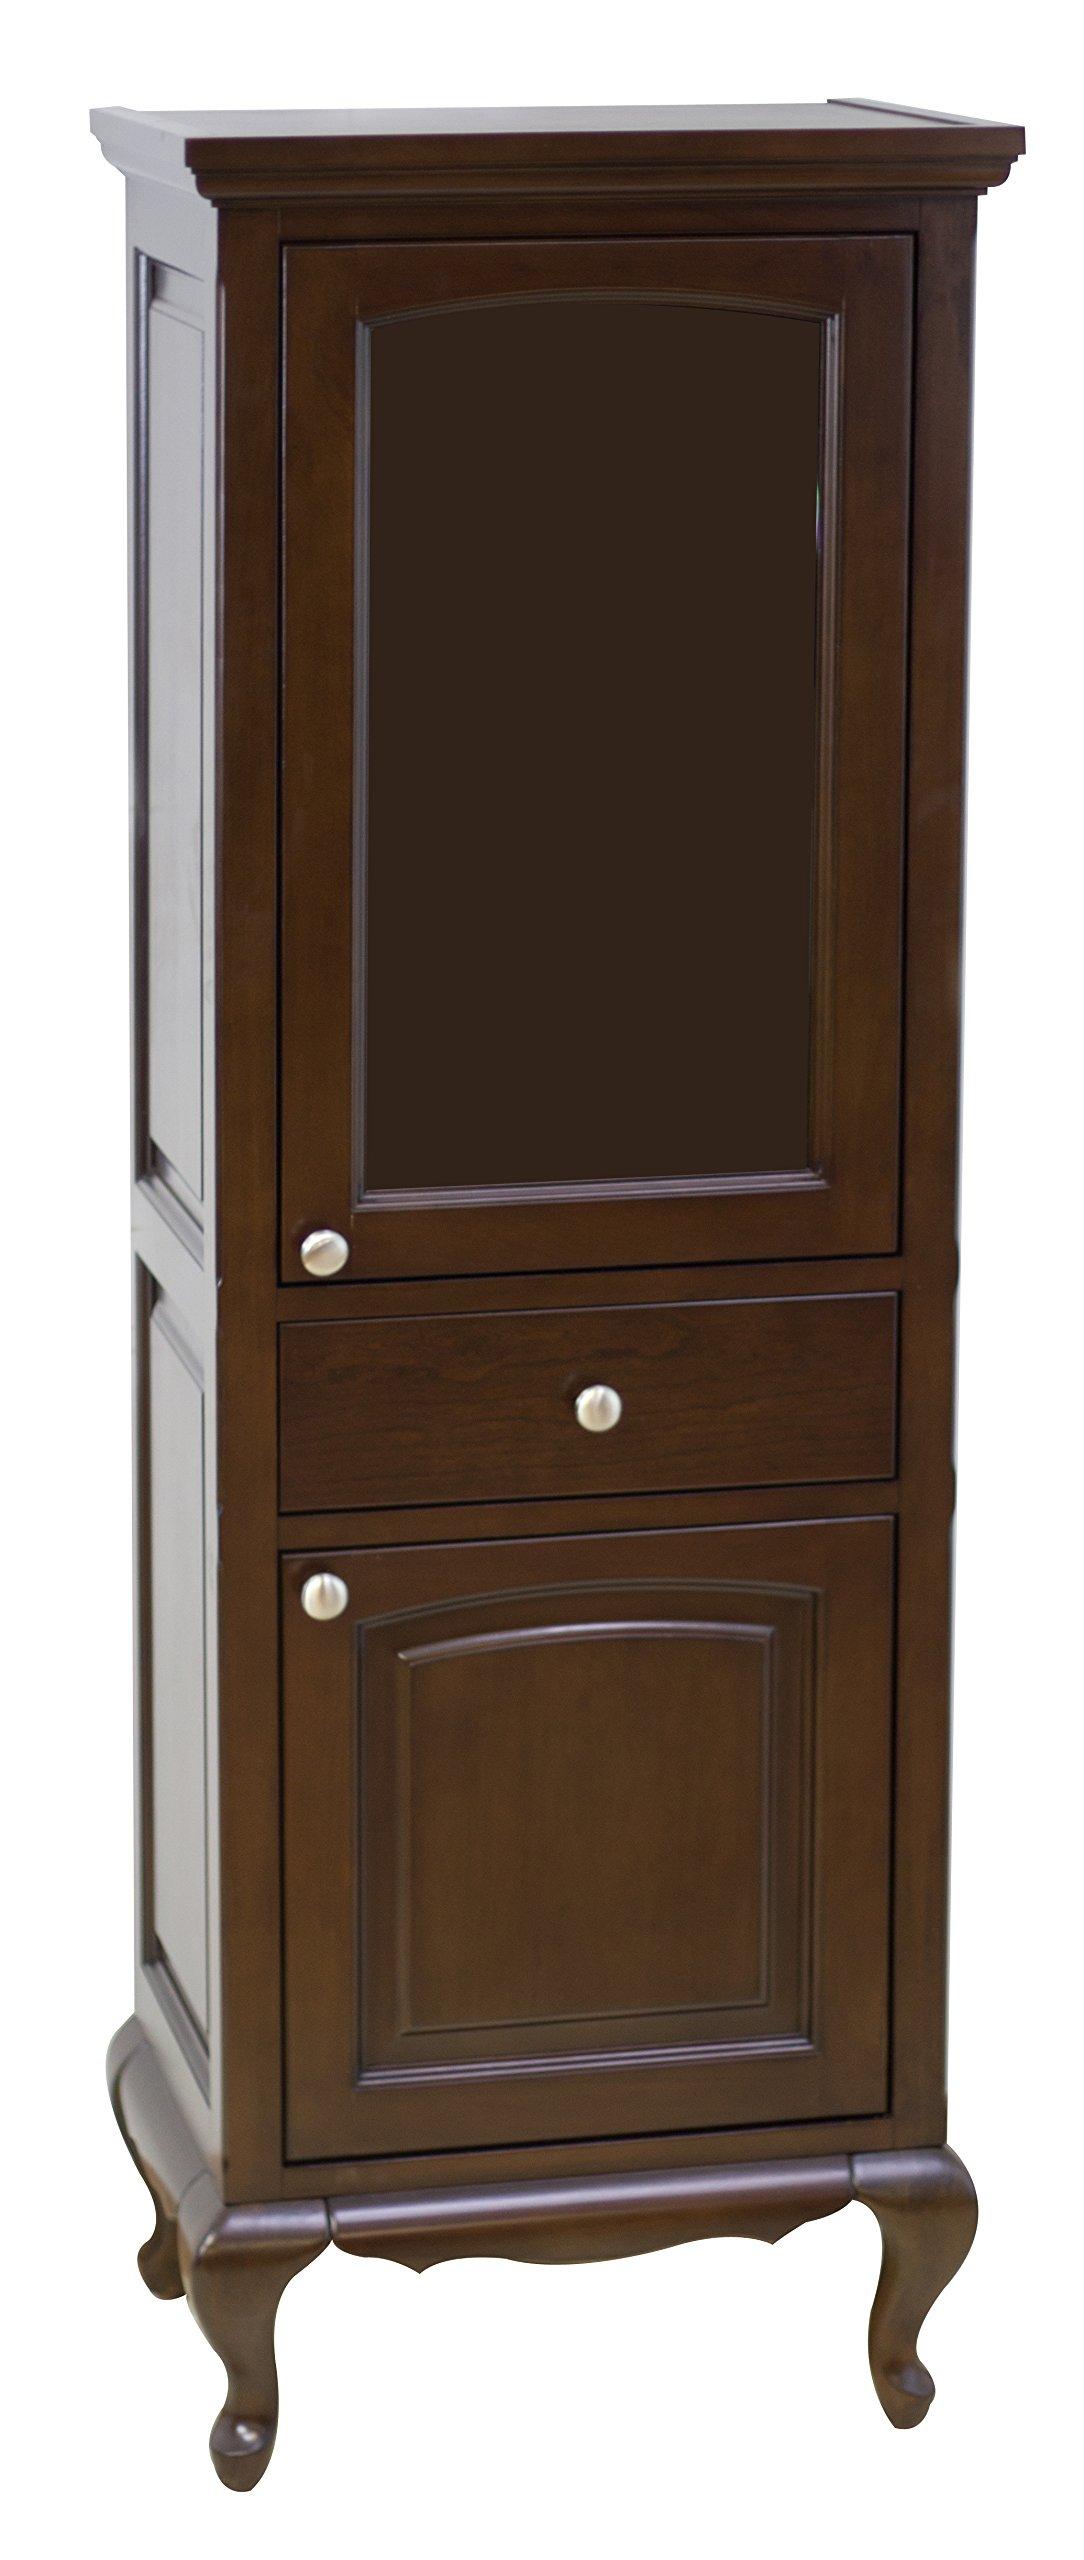 American Imaginations AI-104-57 Traditional Birch Wood-Veneer Linen Tower, 21.5-Inch x 63-Inch, Walnut Finish